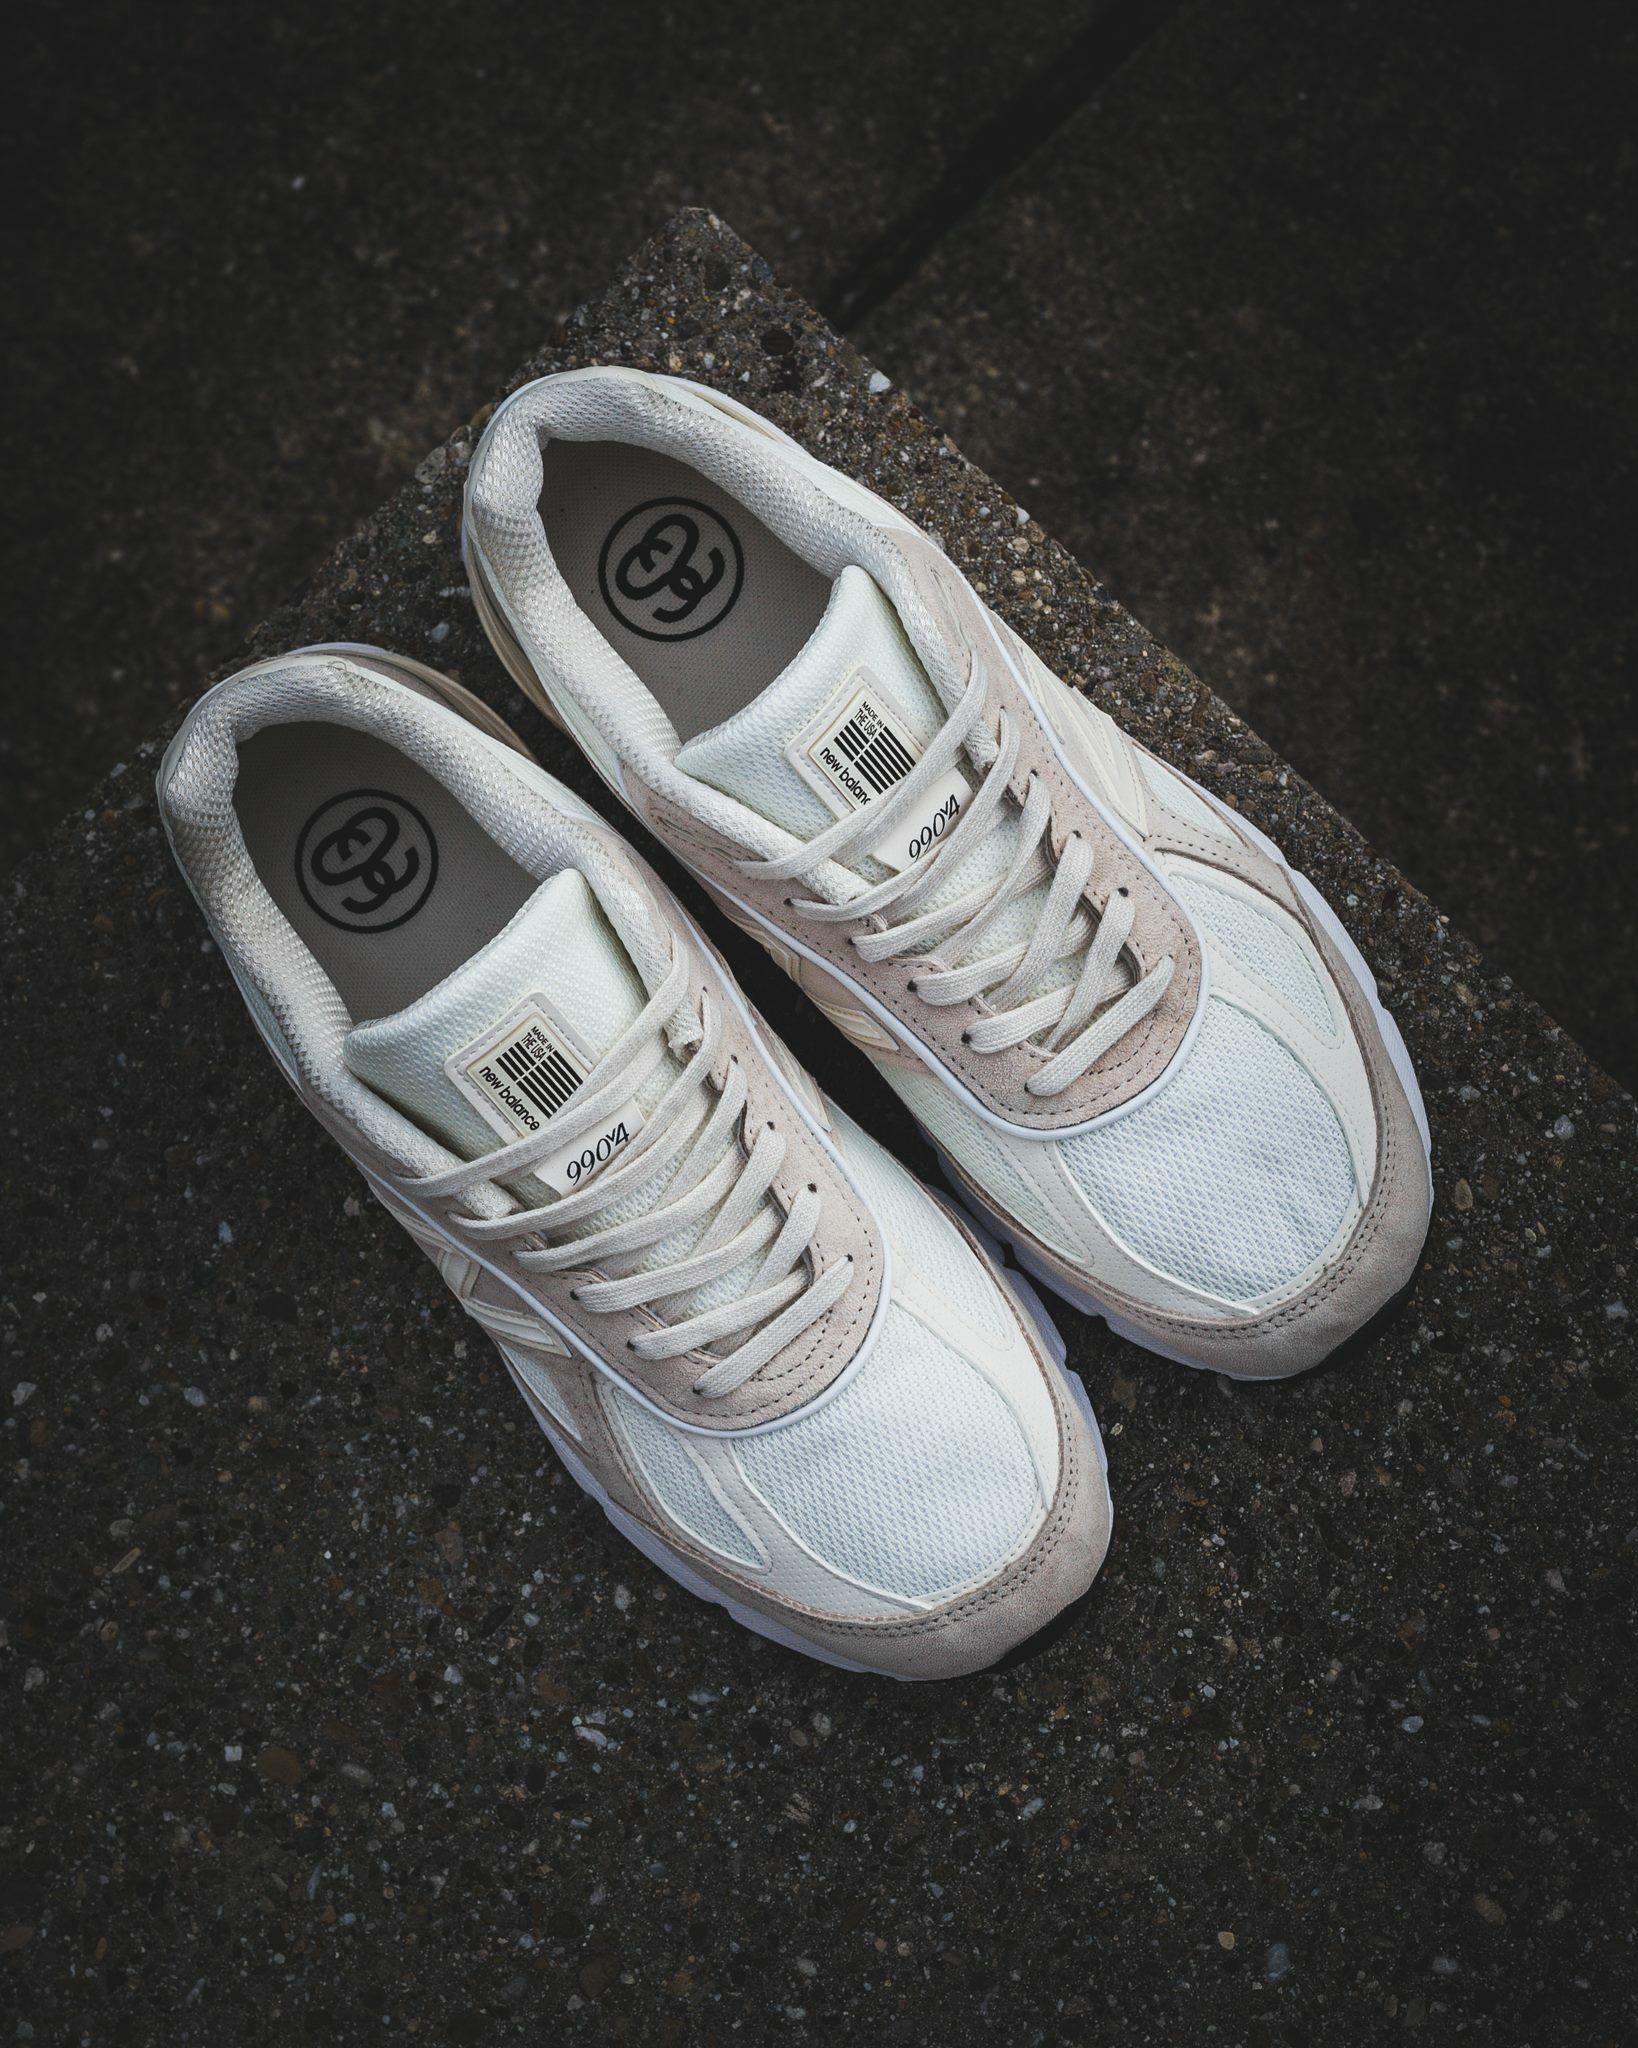 best website 30ea8 02362 Stüssy x New Balance 990   Sneakers: New Balance 990 ...